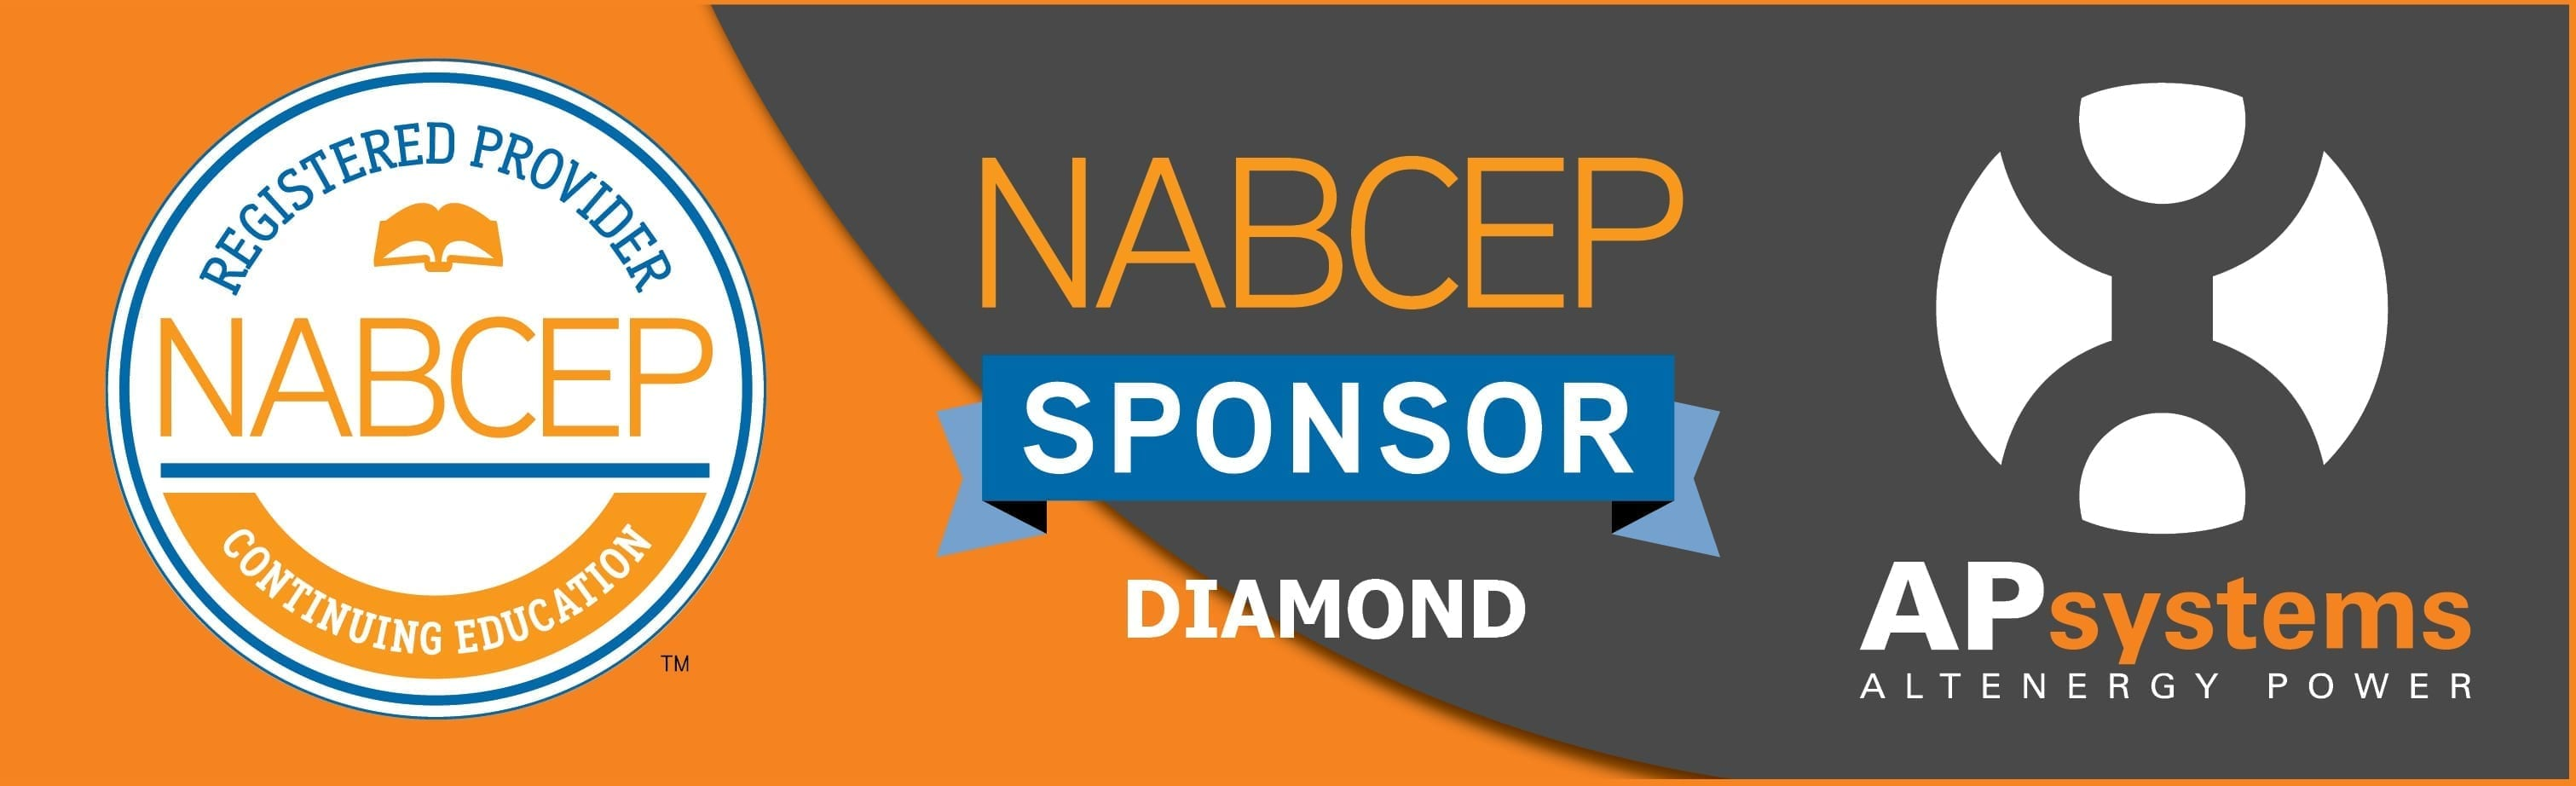 E-sig banner NABCEP